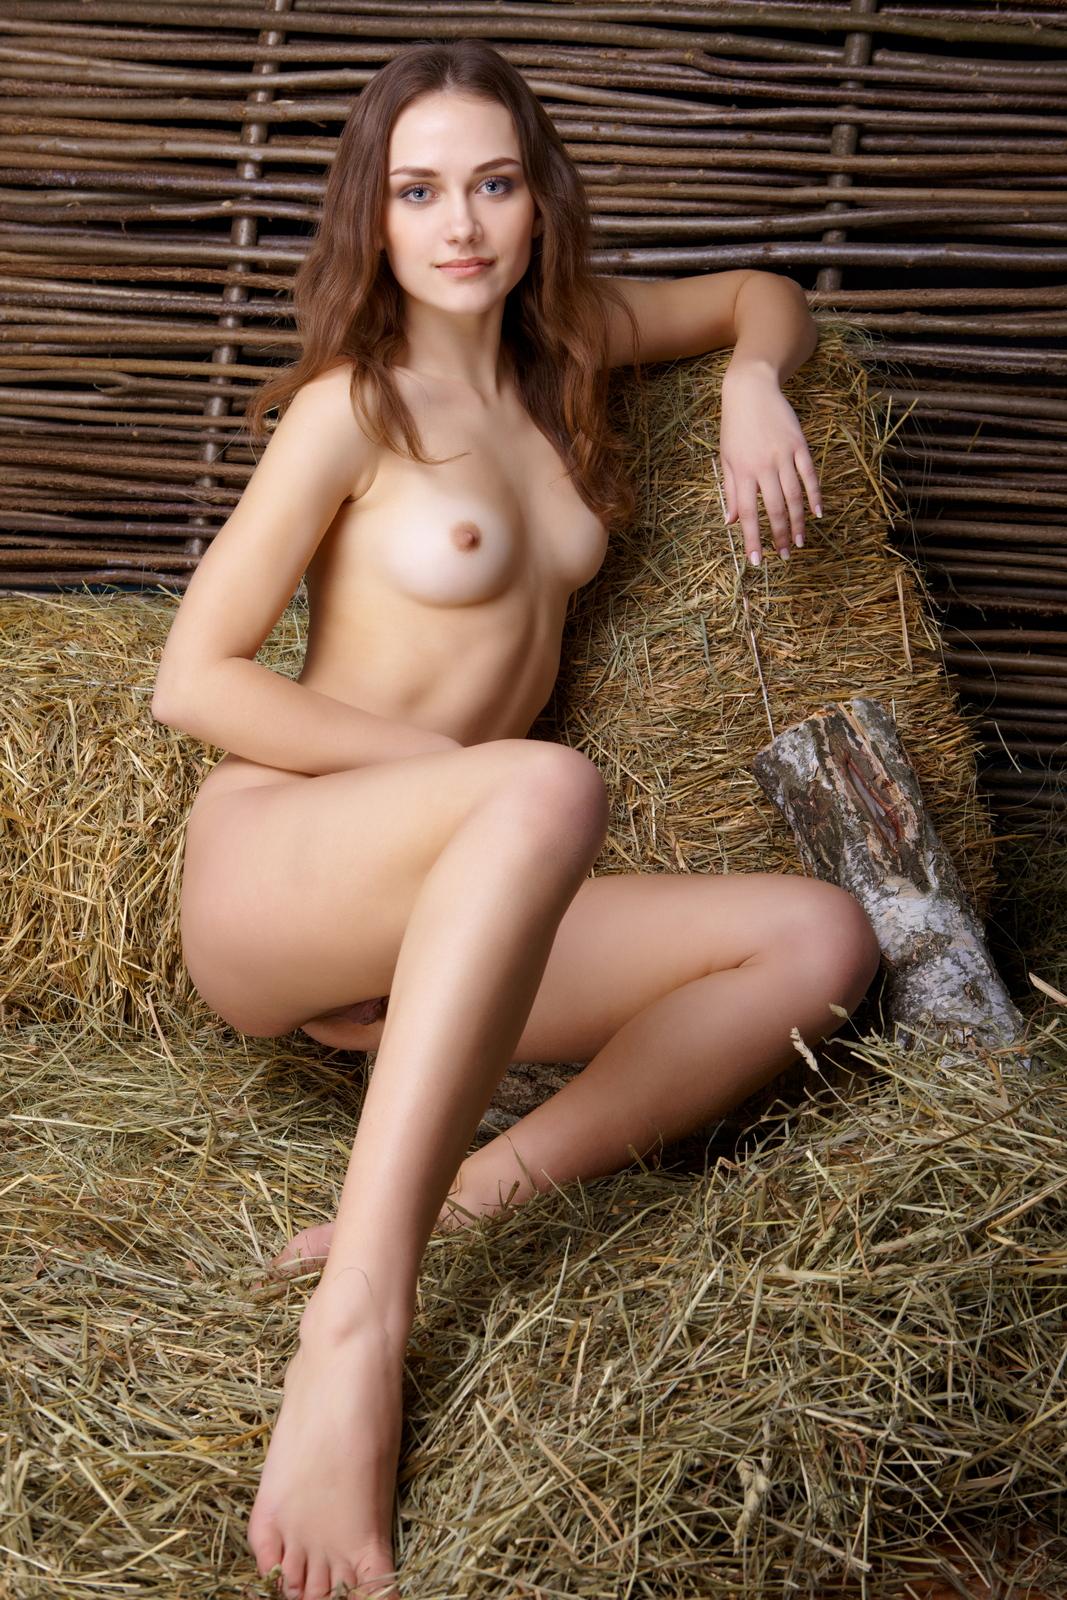 zlatka-a-nude-on-hay-barn-pussy-metart-21